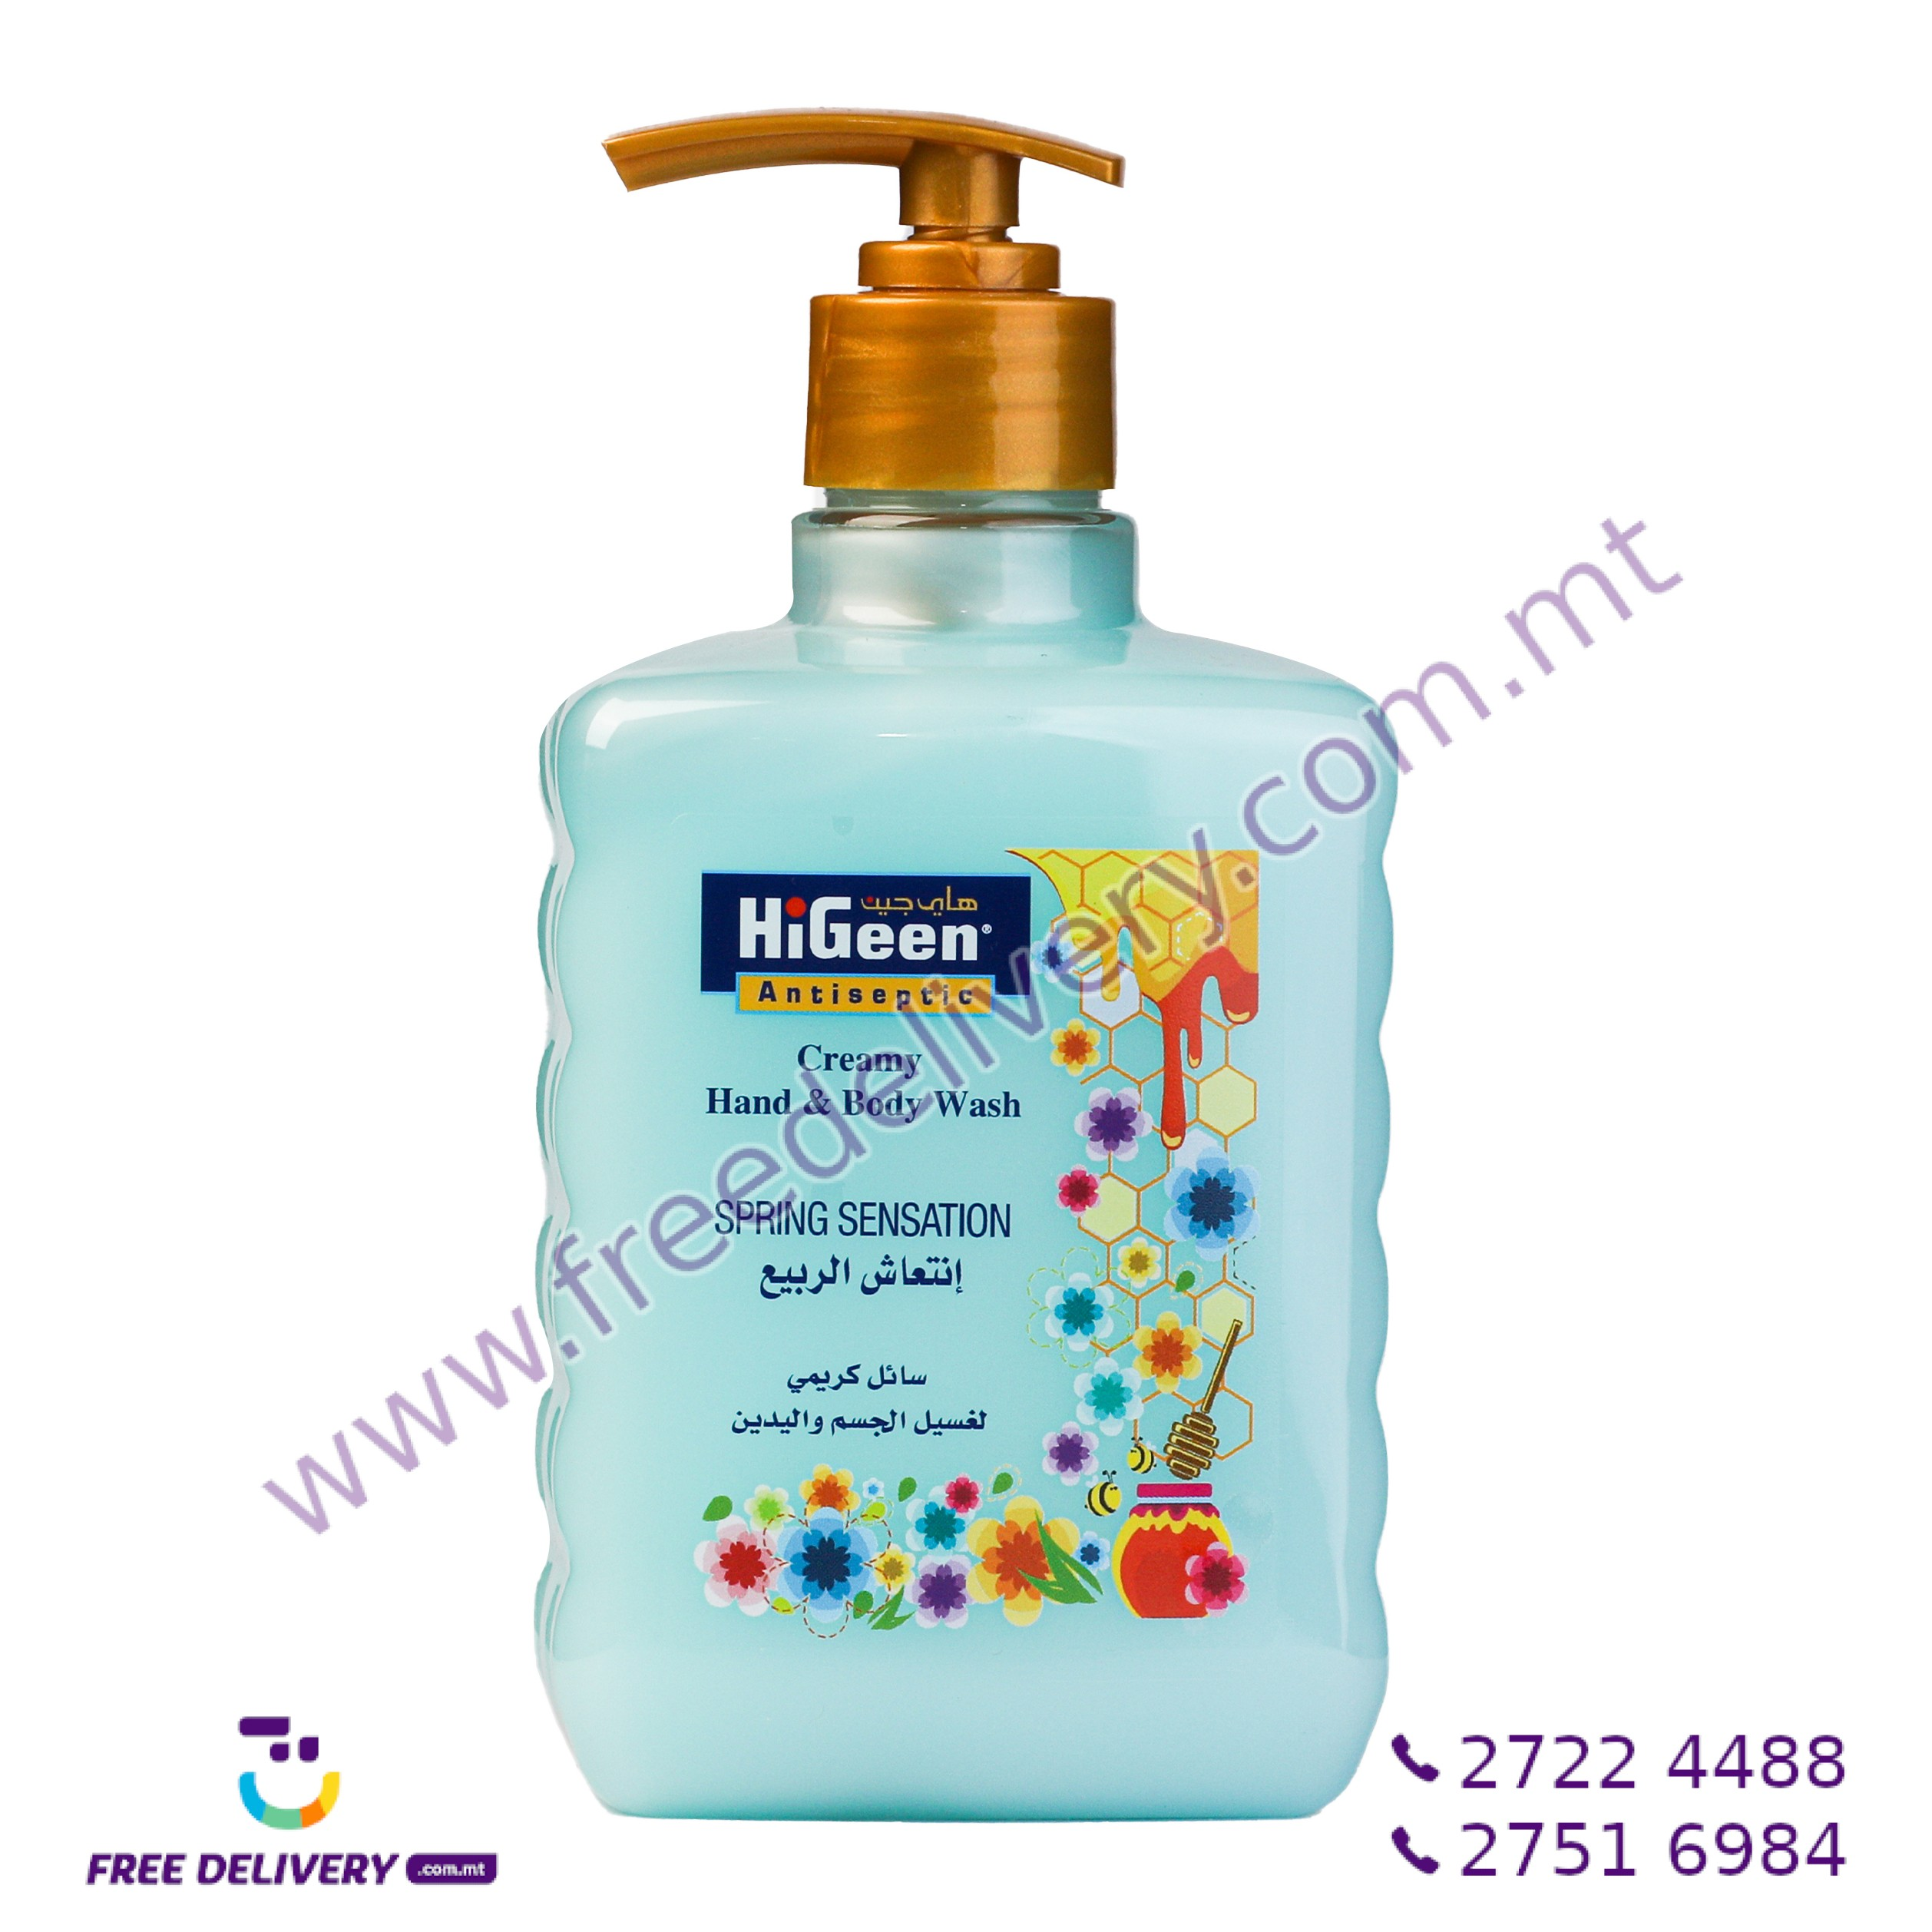 HIGEEN CREAMY HAND & BODY WASH SPRING SENSATION 500ML HI003158